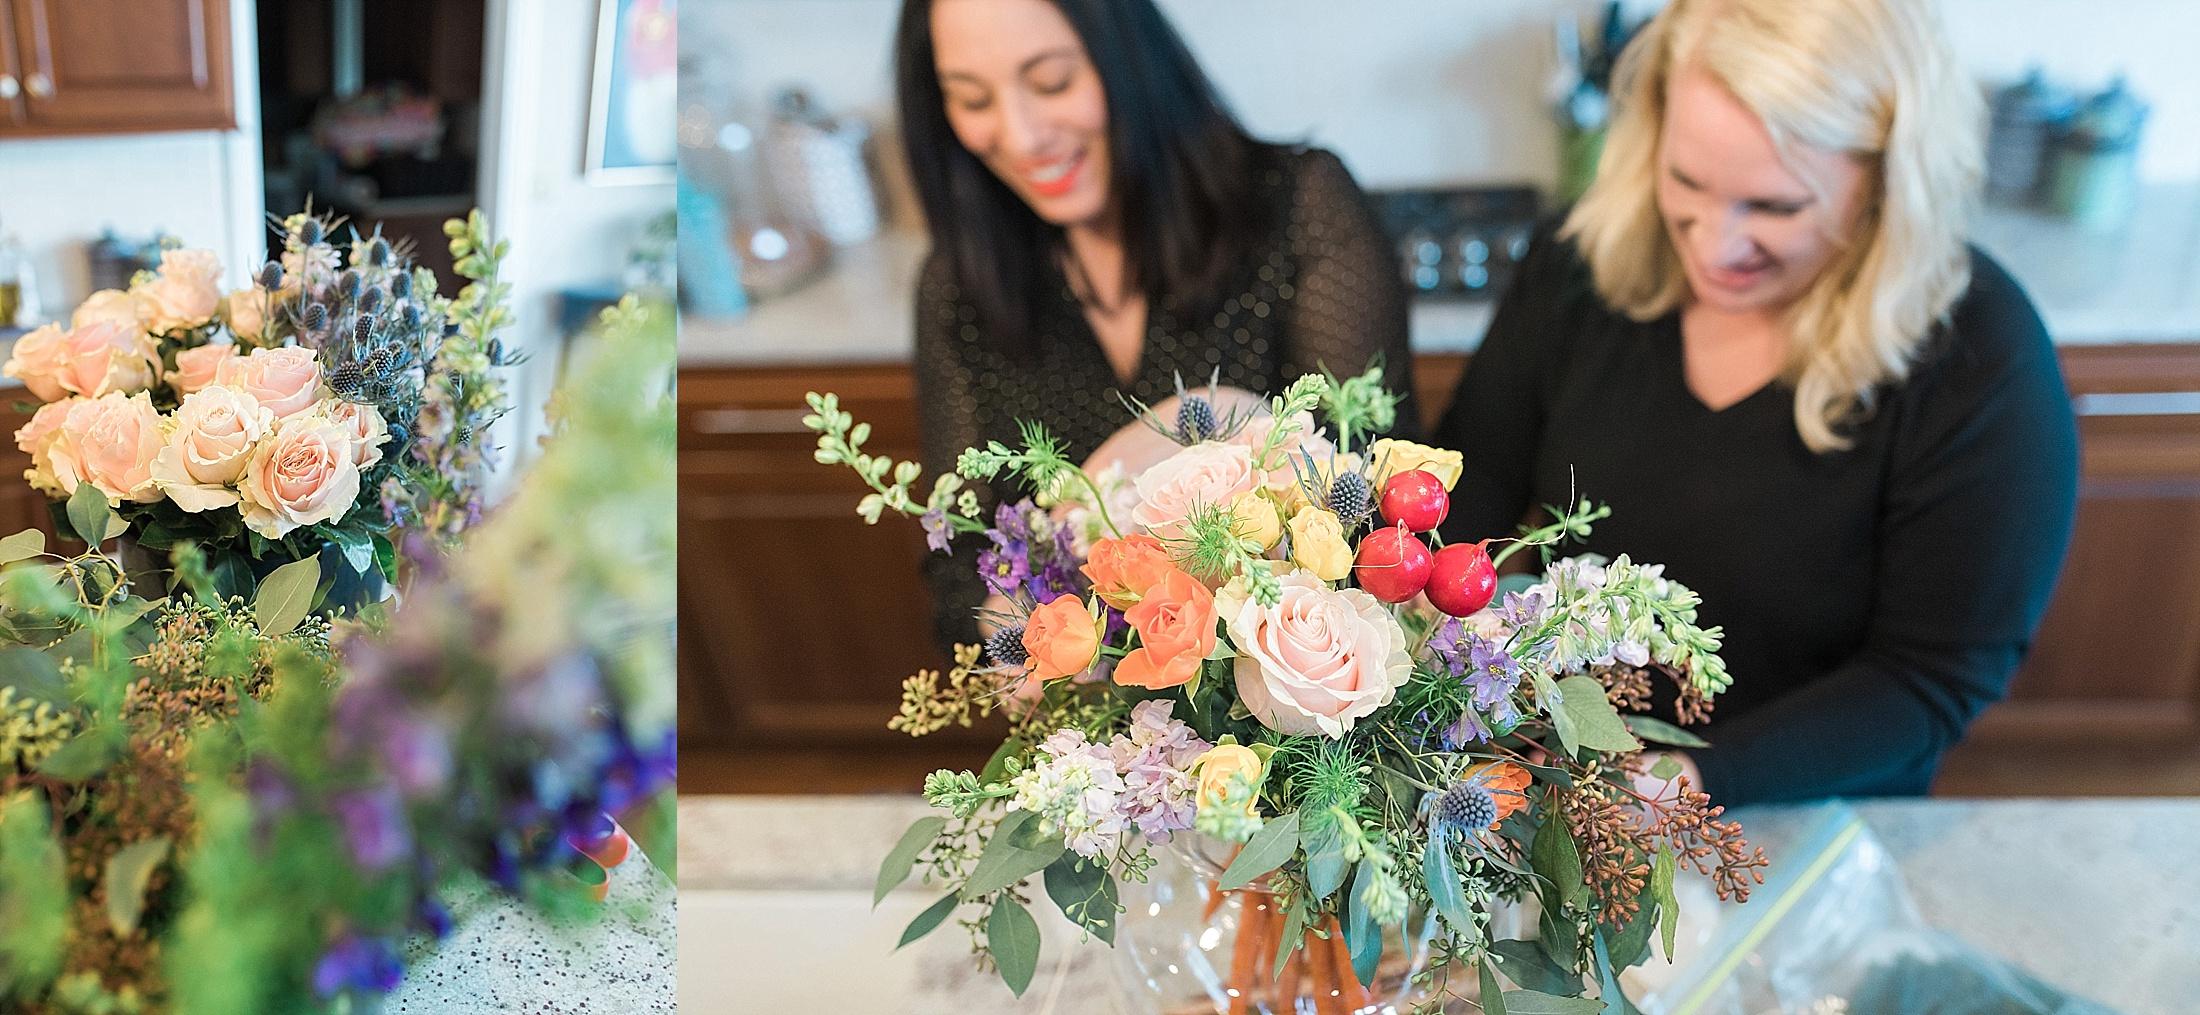 champaign-illinois-florist-watercan-designs-easter-spring-vegetable-flower-arrangement_2022.jpg